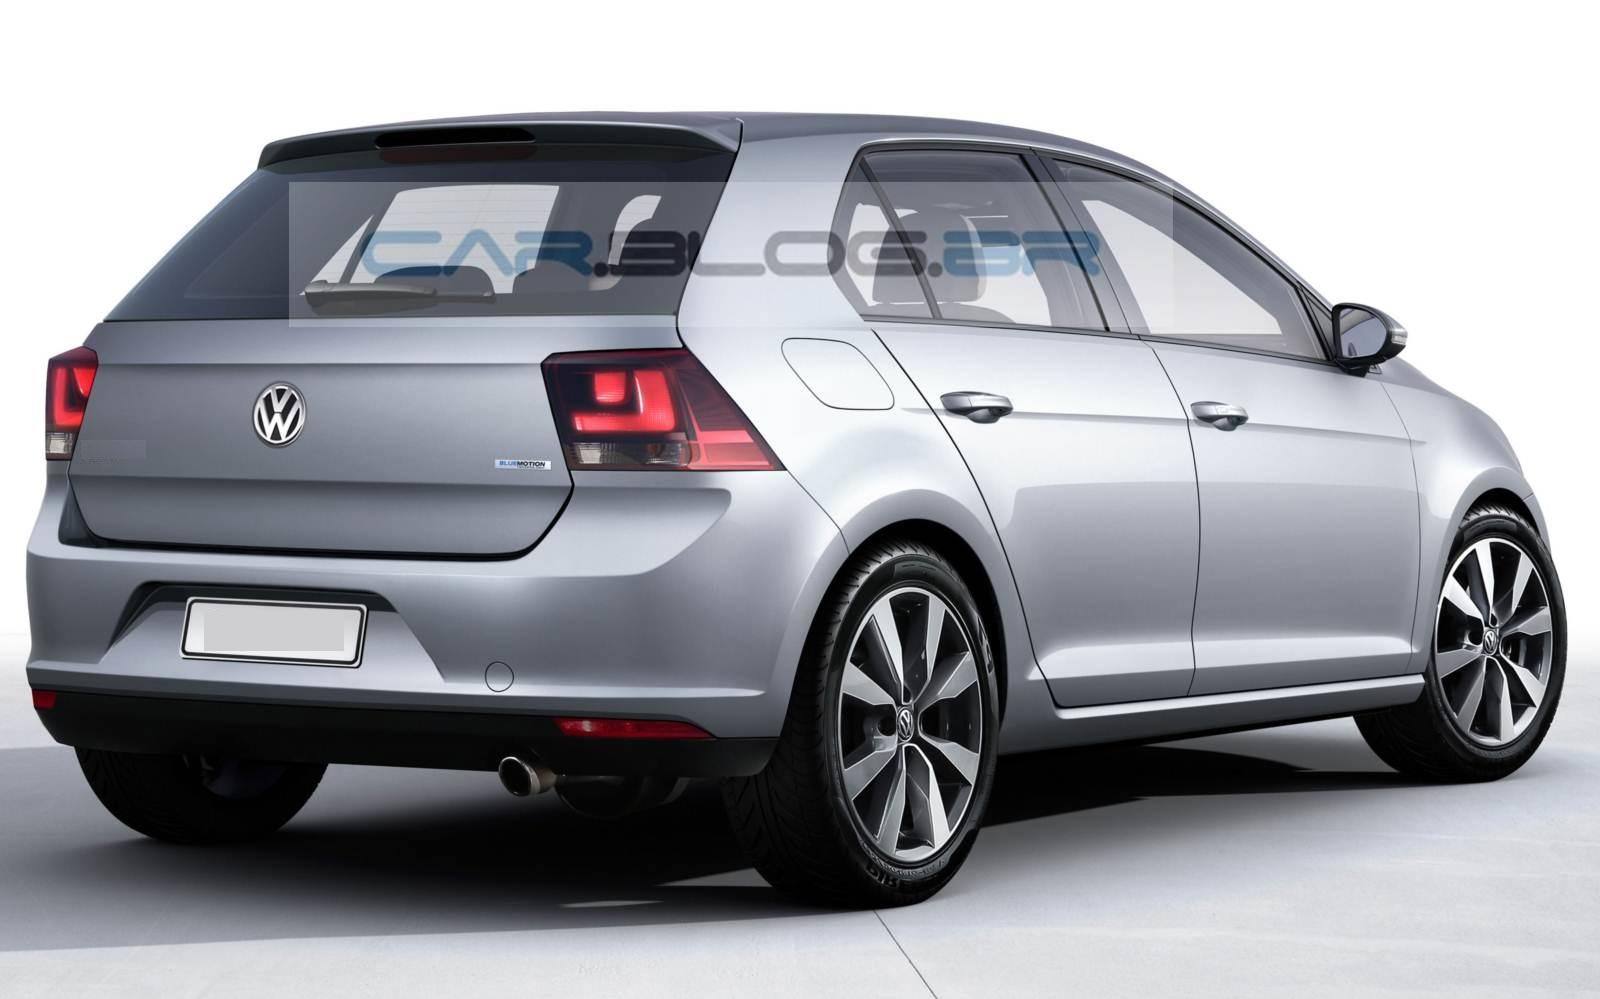 lan amento volkswagen 2018. Lan Amento Volkswagen 2018